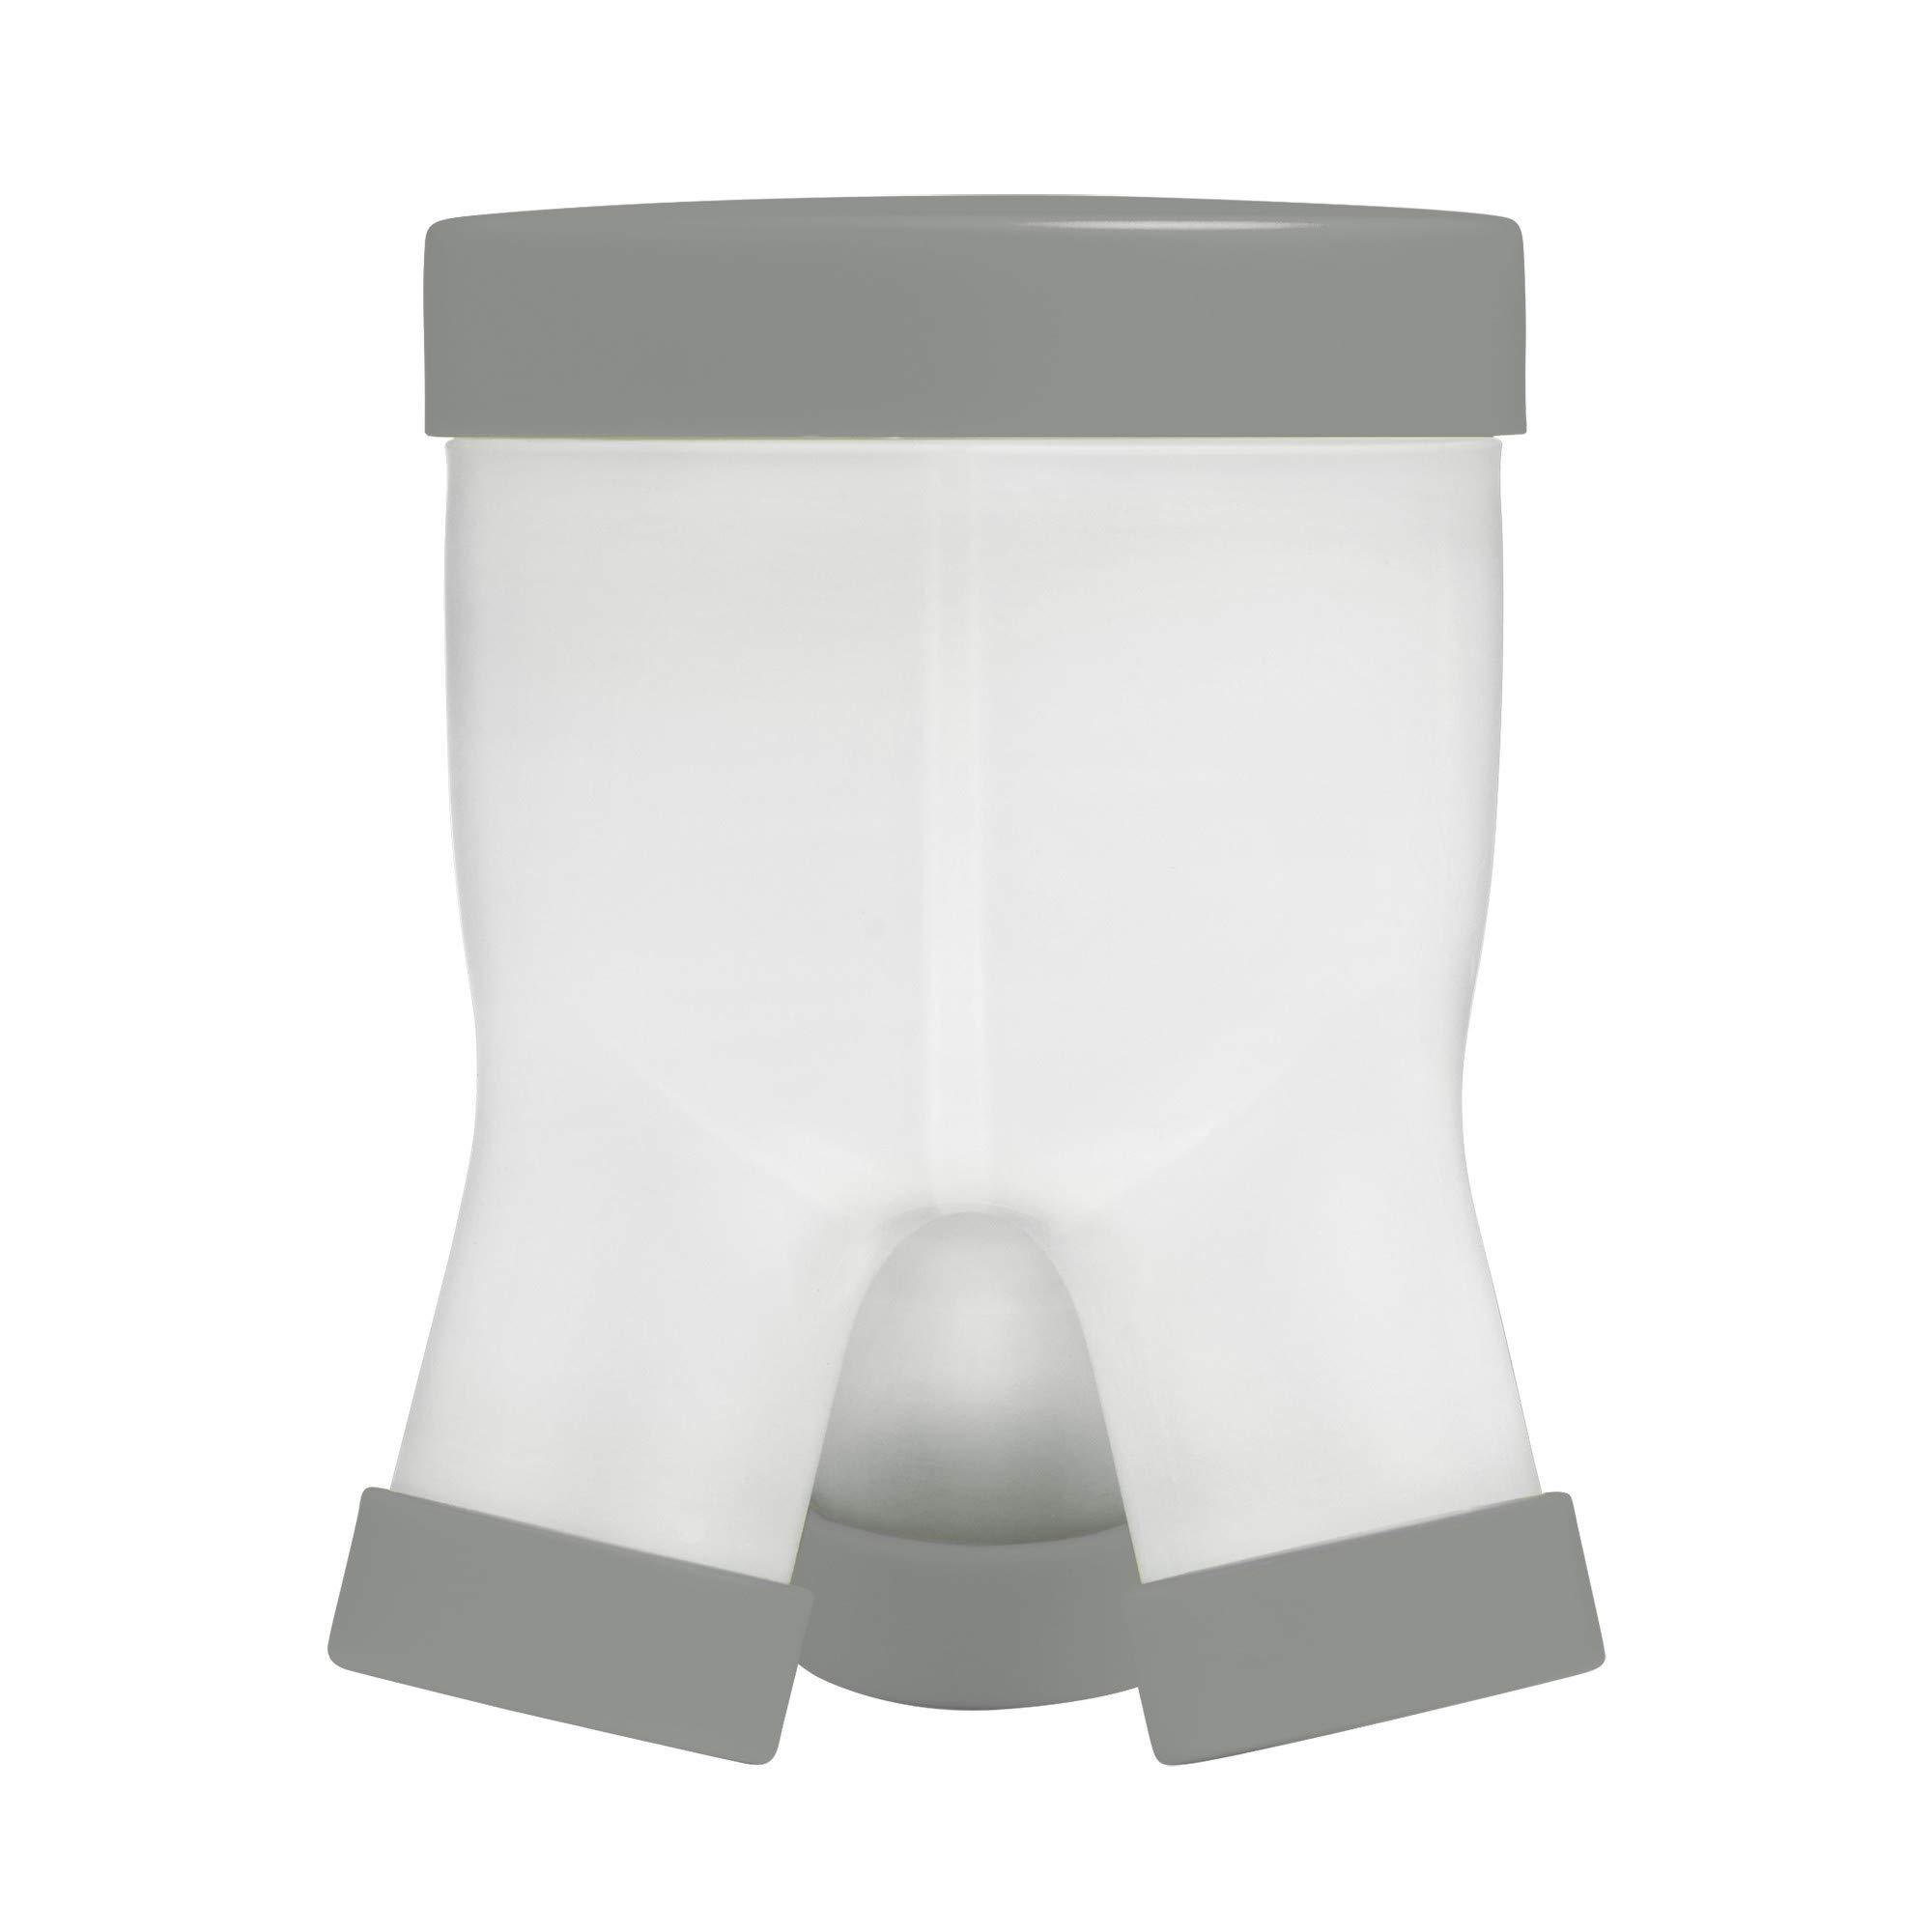 Boon Tripod Formula Container - Grey